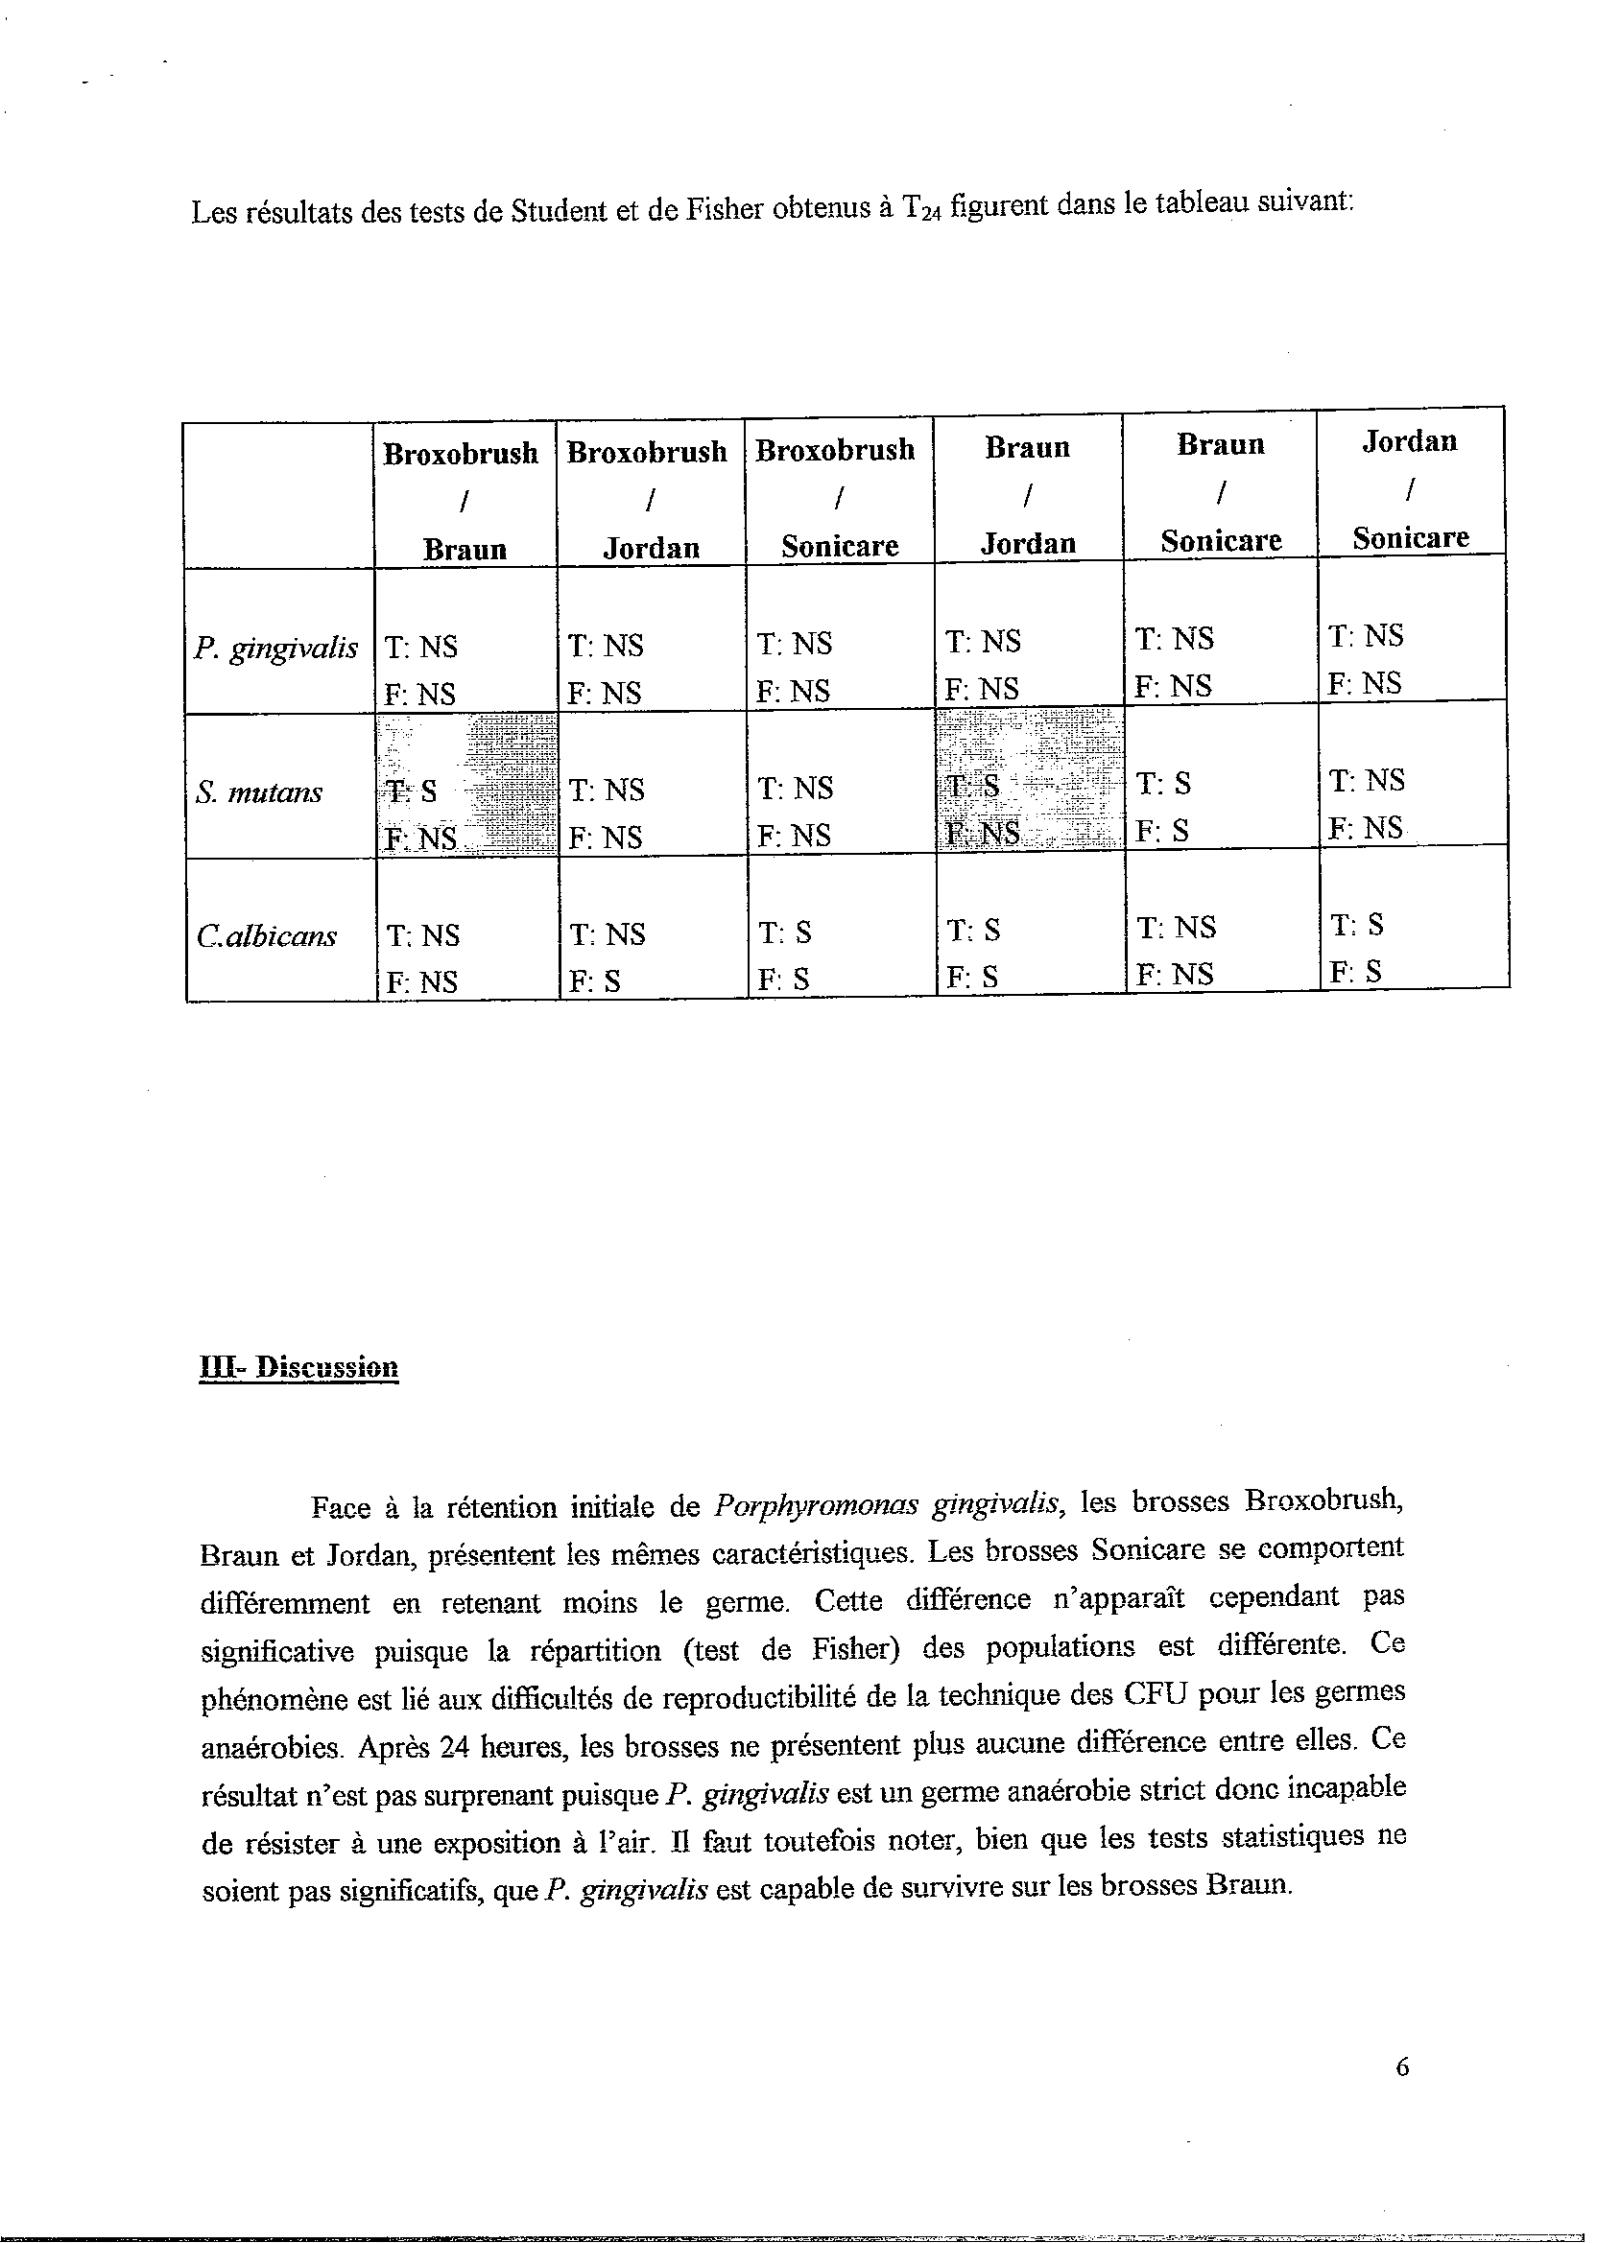 Etude6-page7